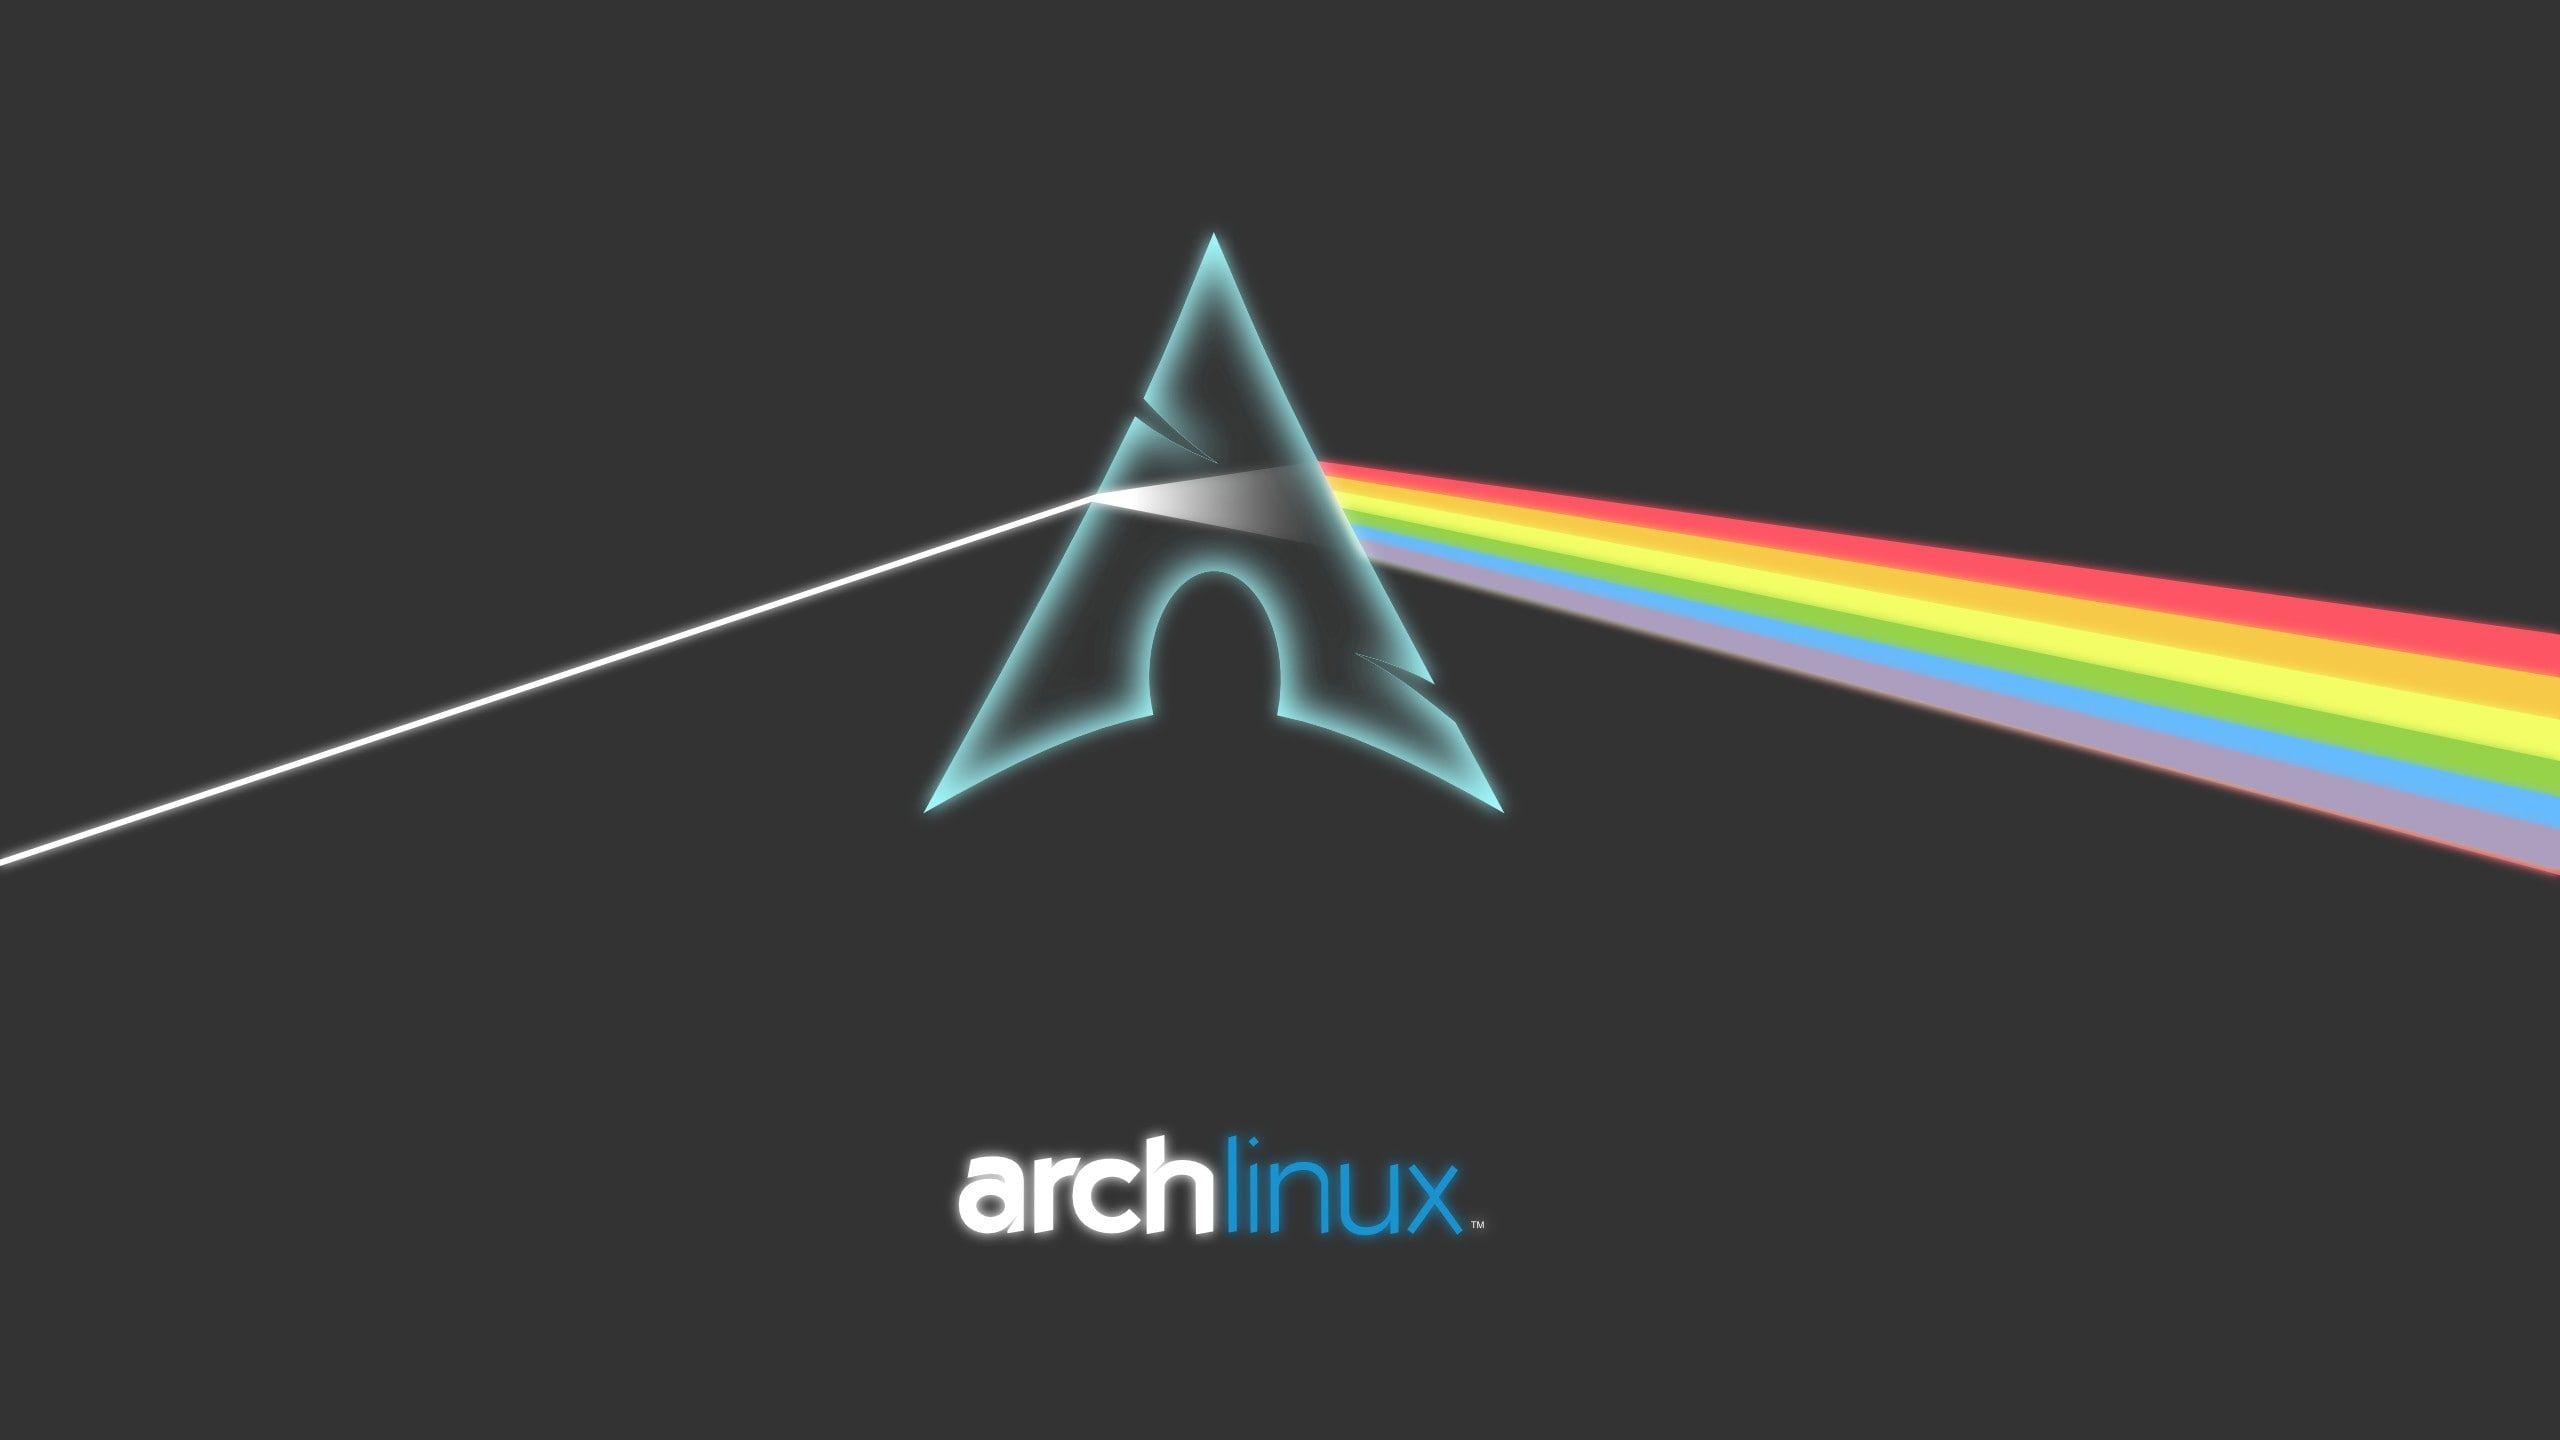 Arch Linux Pink Floyd Linux 2k Wallpaper Hdwallpaper Desktop Hd Wallpaper Neon Wallpaper Arch Linux